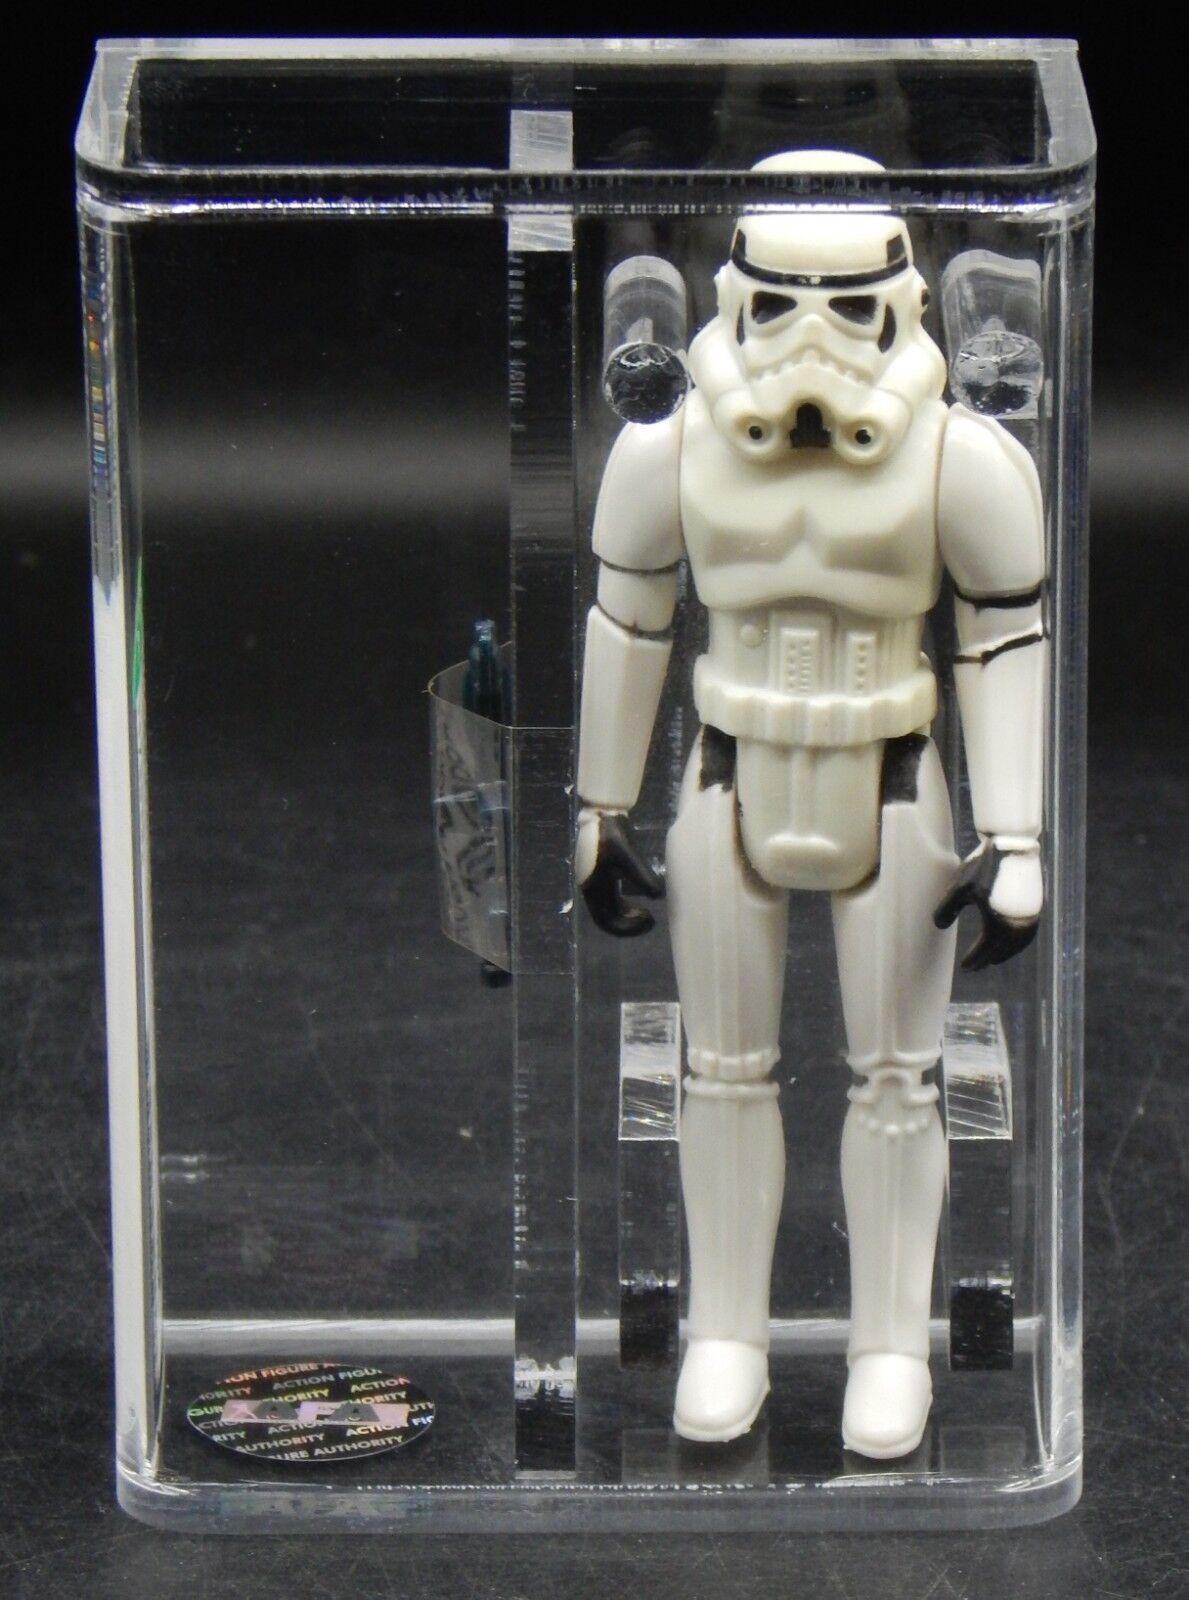 AFA 80 Star Wars Imperial STORMTROOPER Kenner 1977 vintage action figure toy